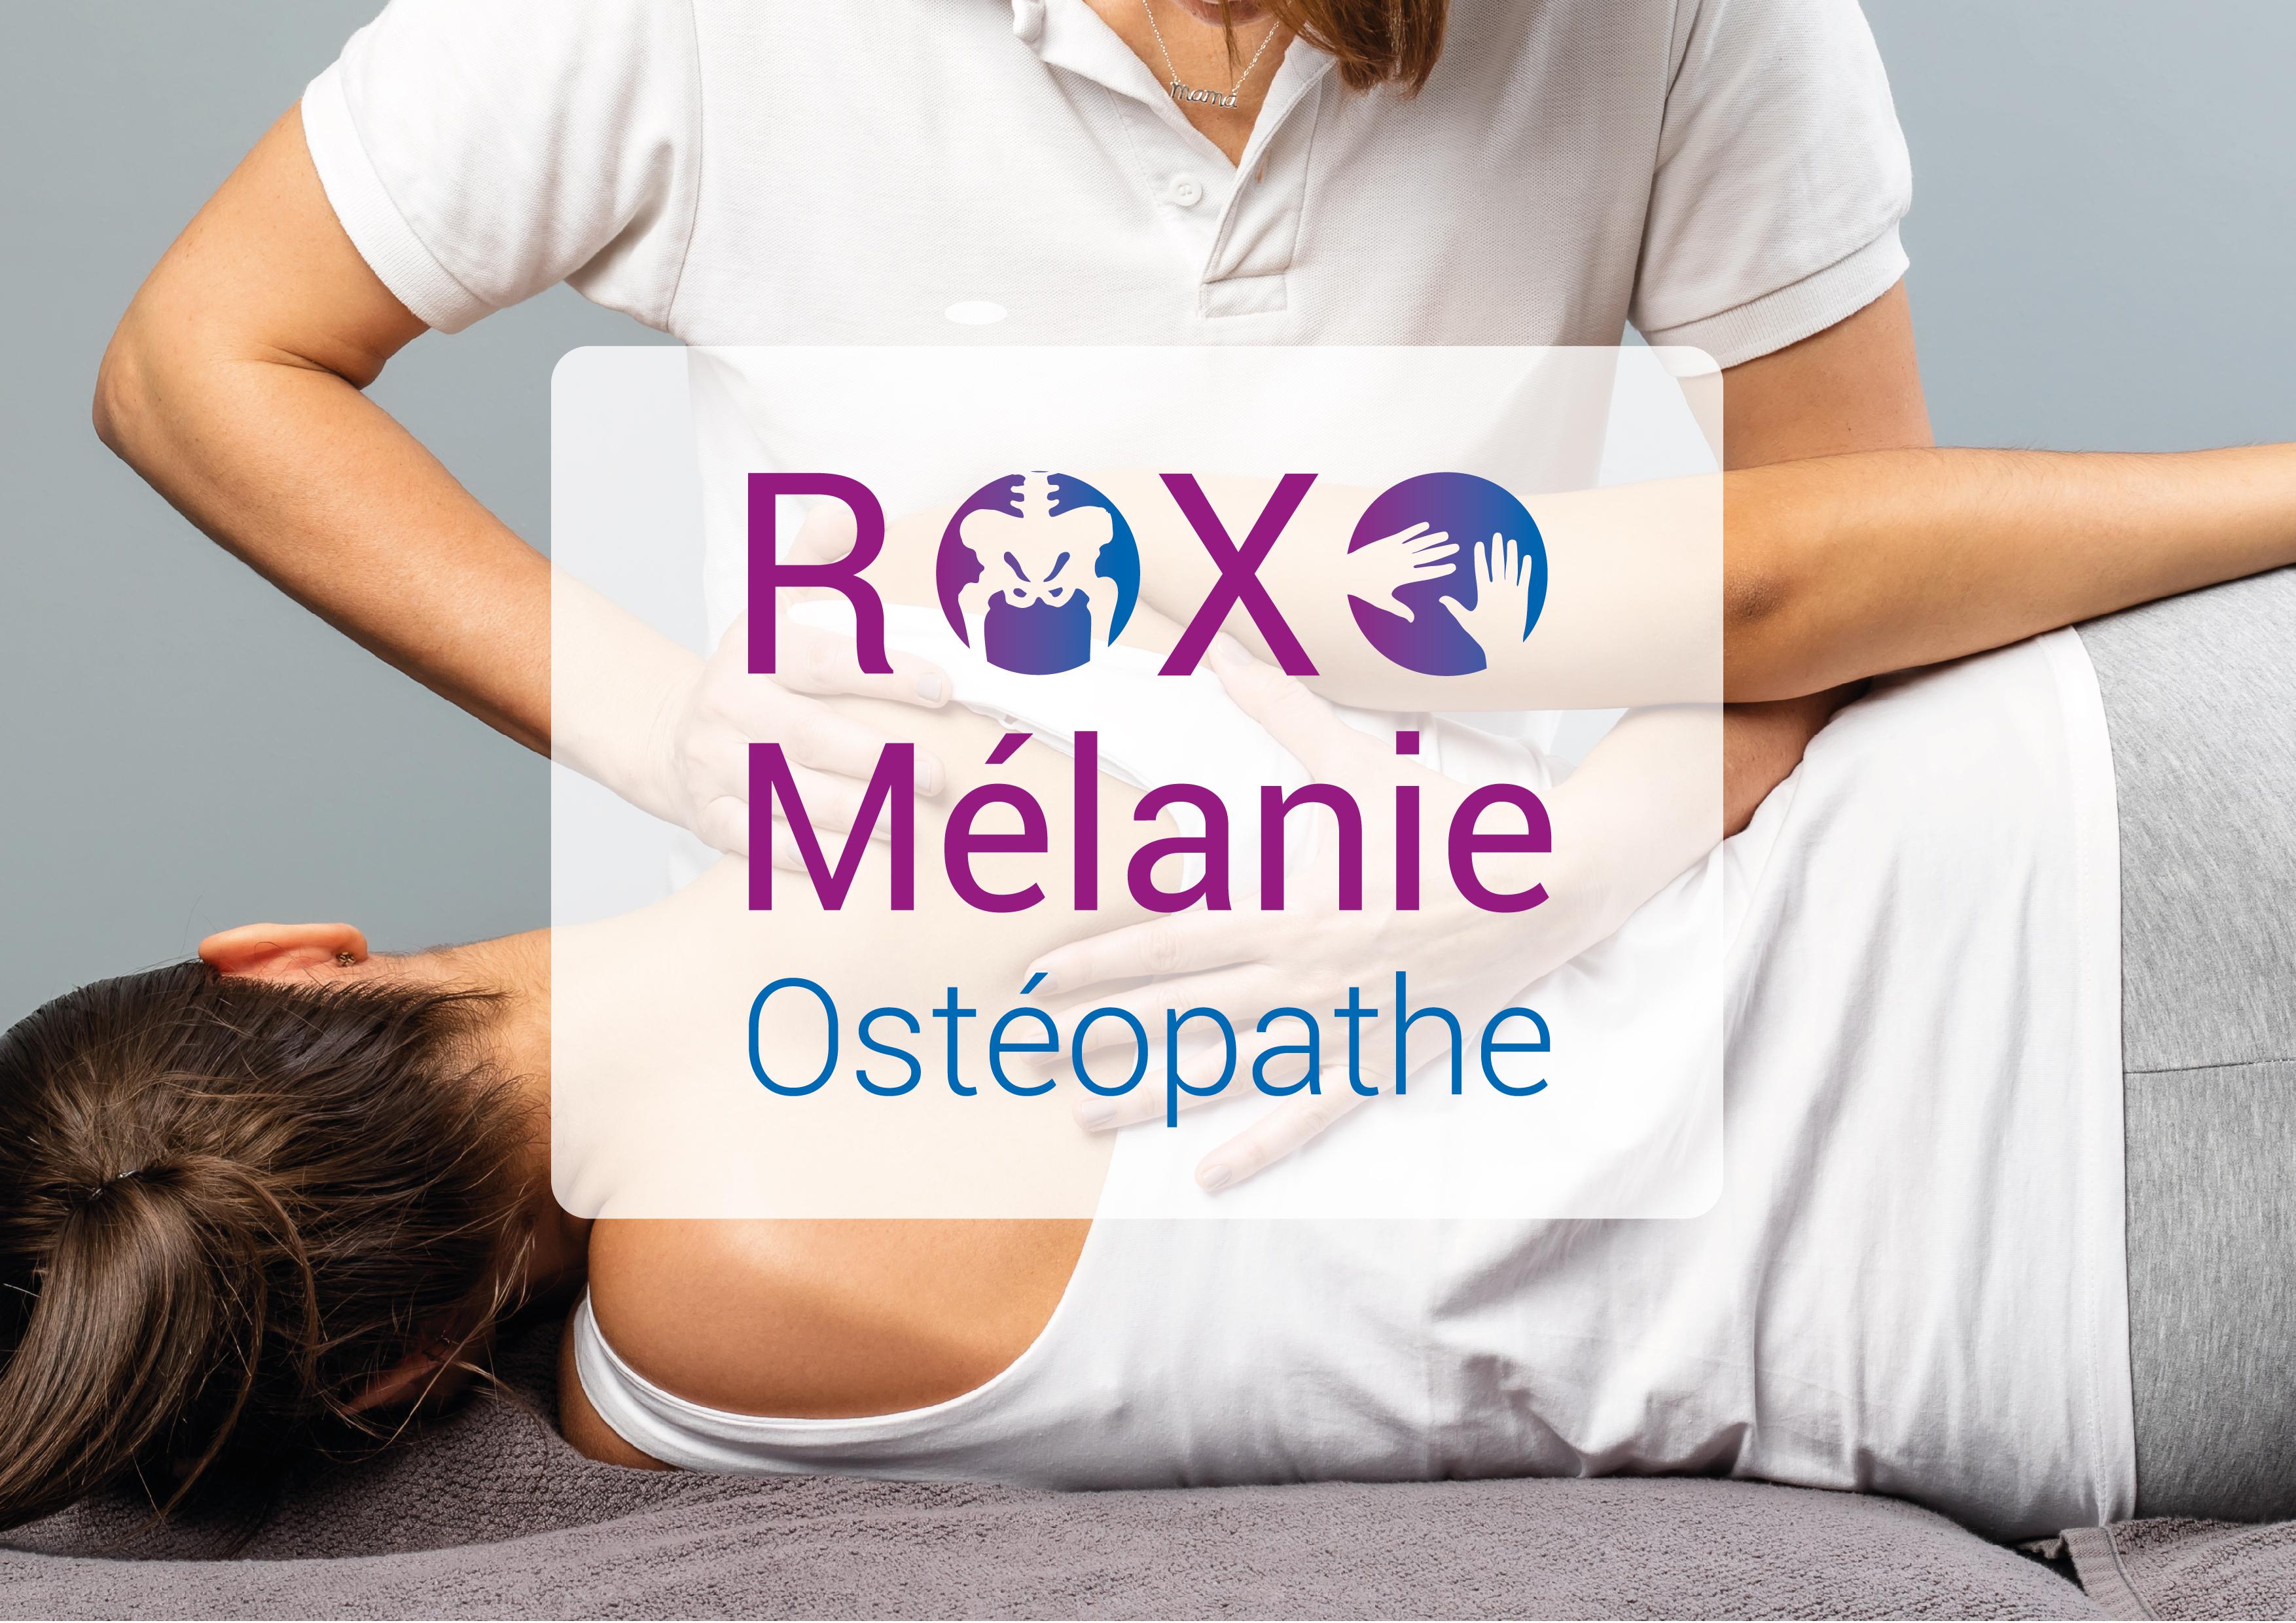 Mélanie Roxo - Ostéopathe